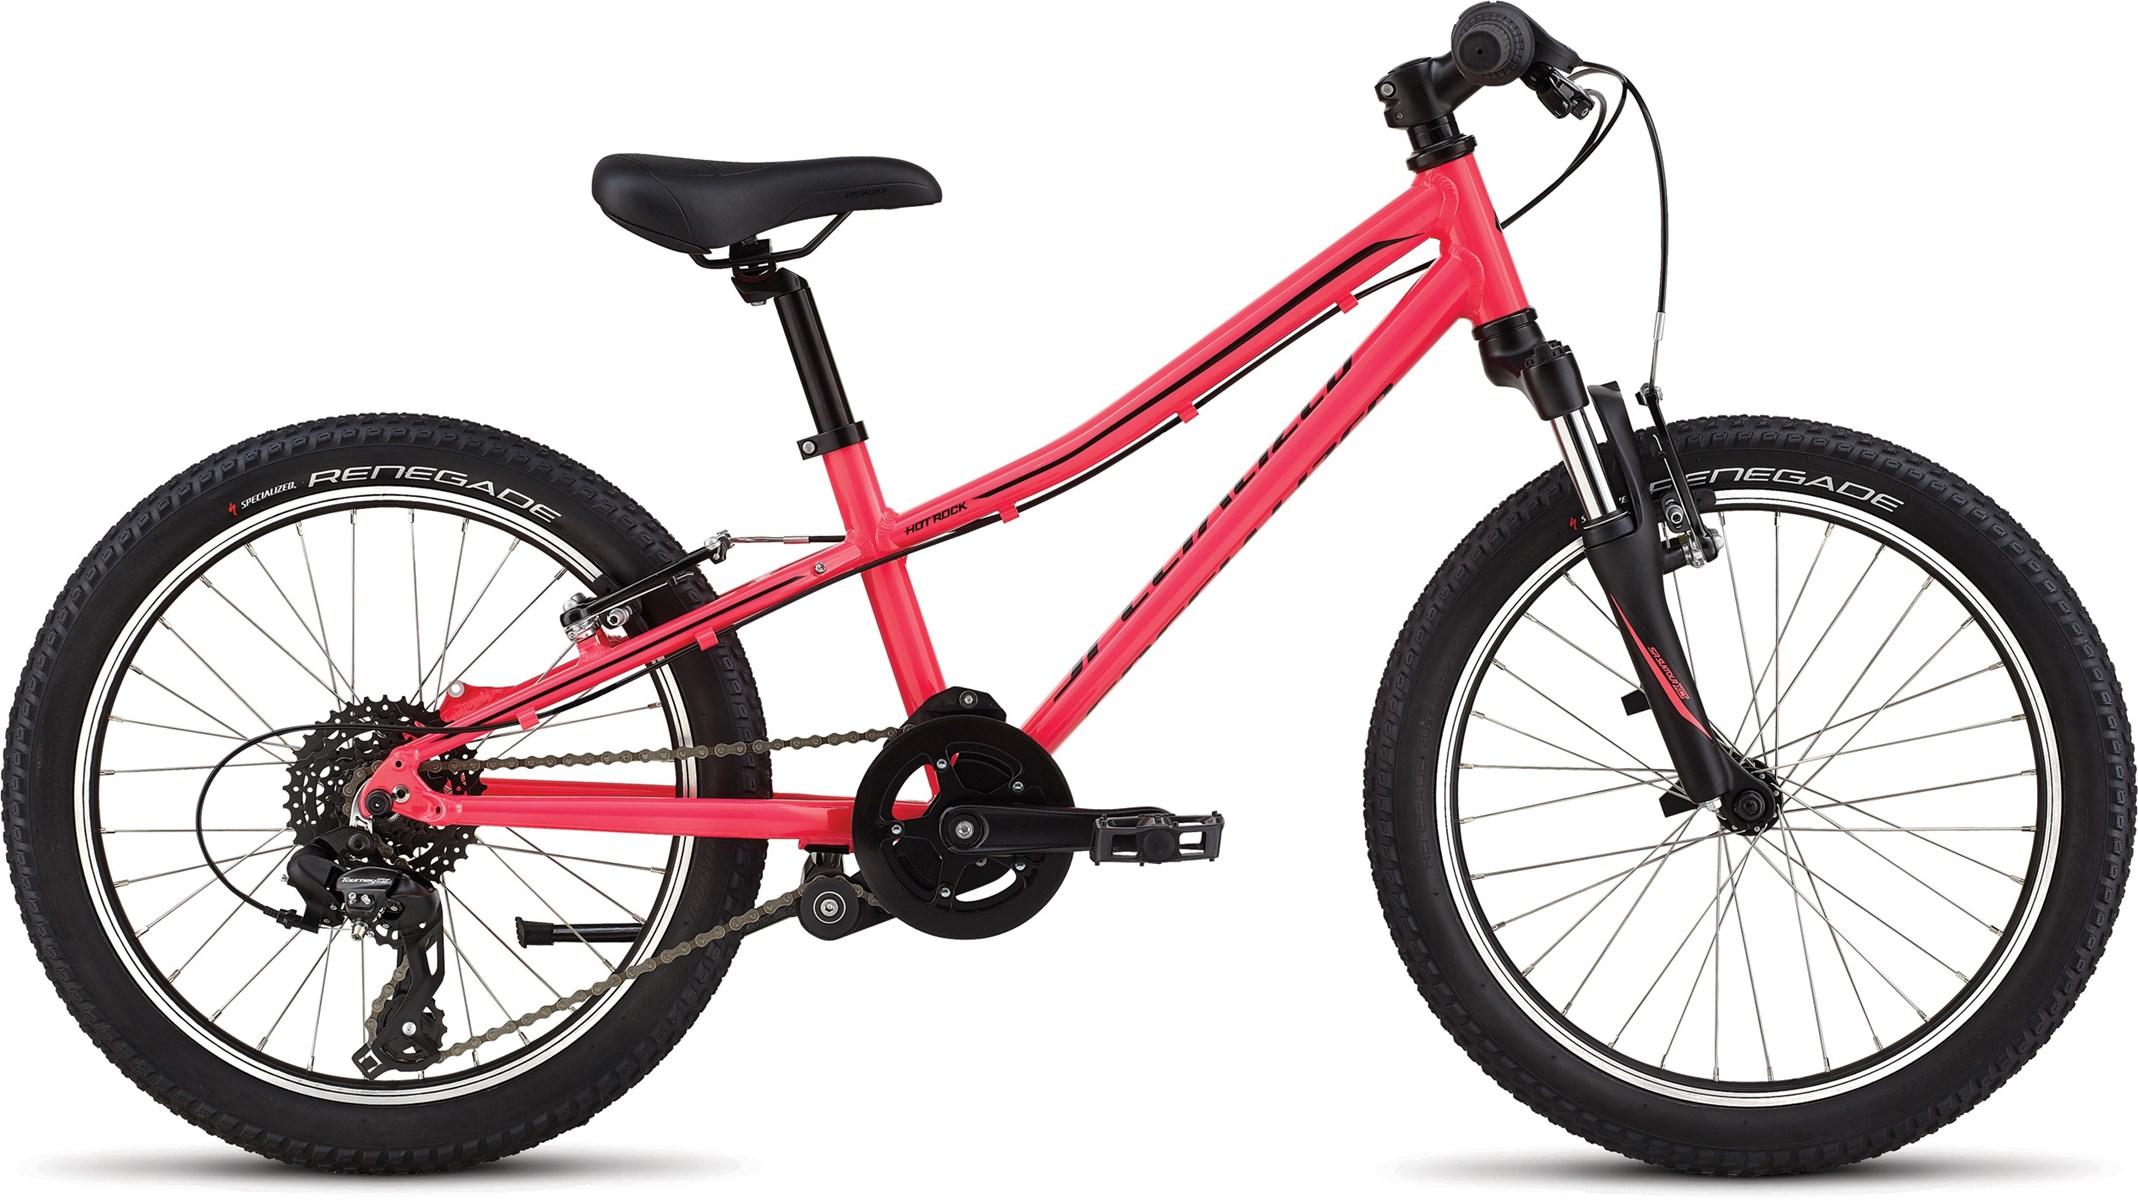 Specialized Hotrock 20 Kids Bike 2020 - Acid Pink/Black